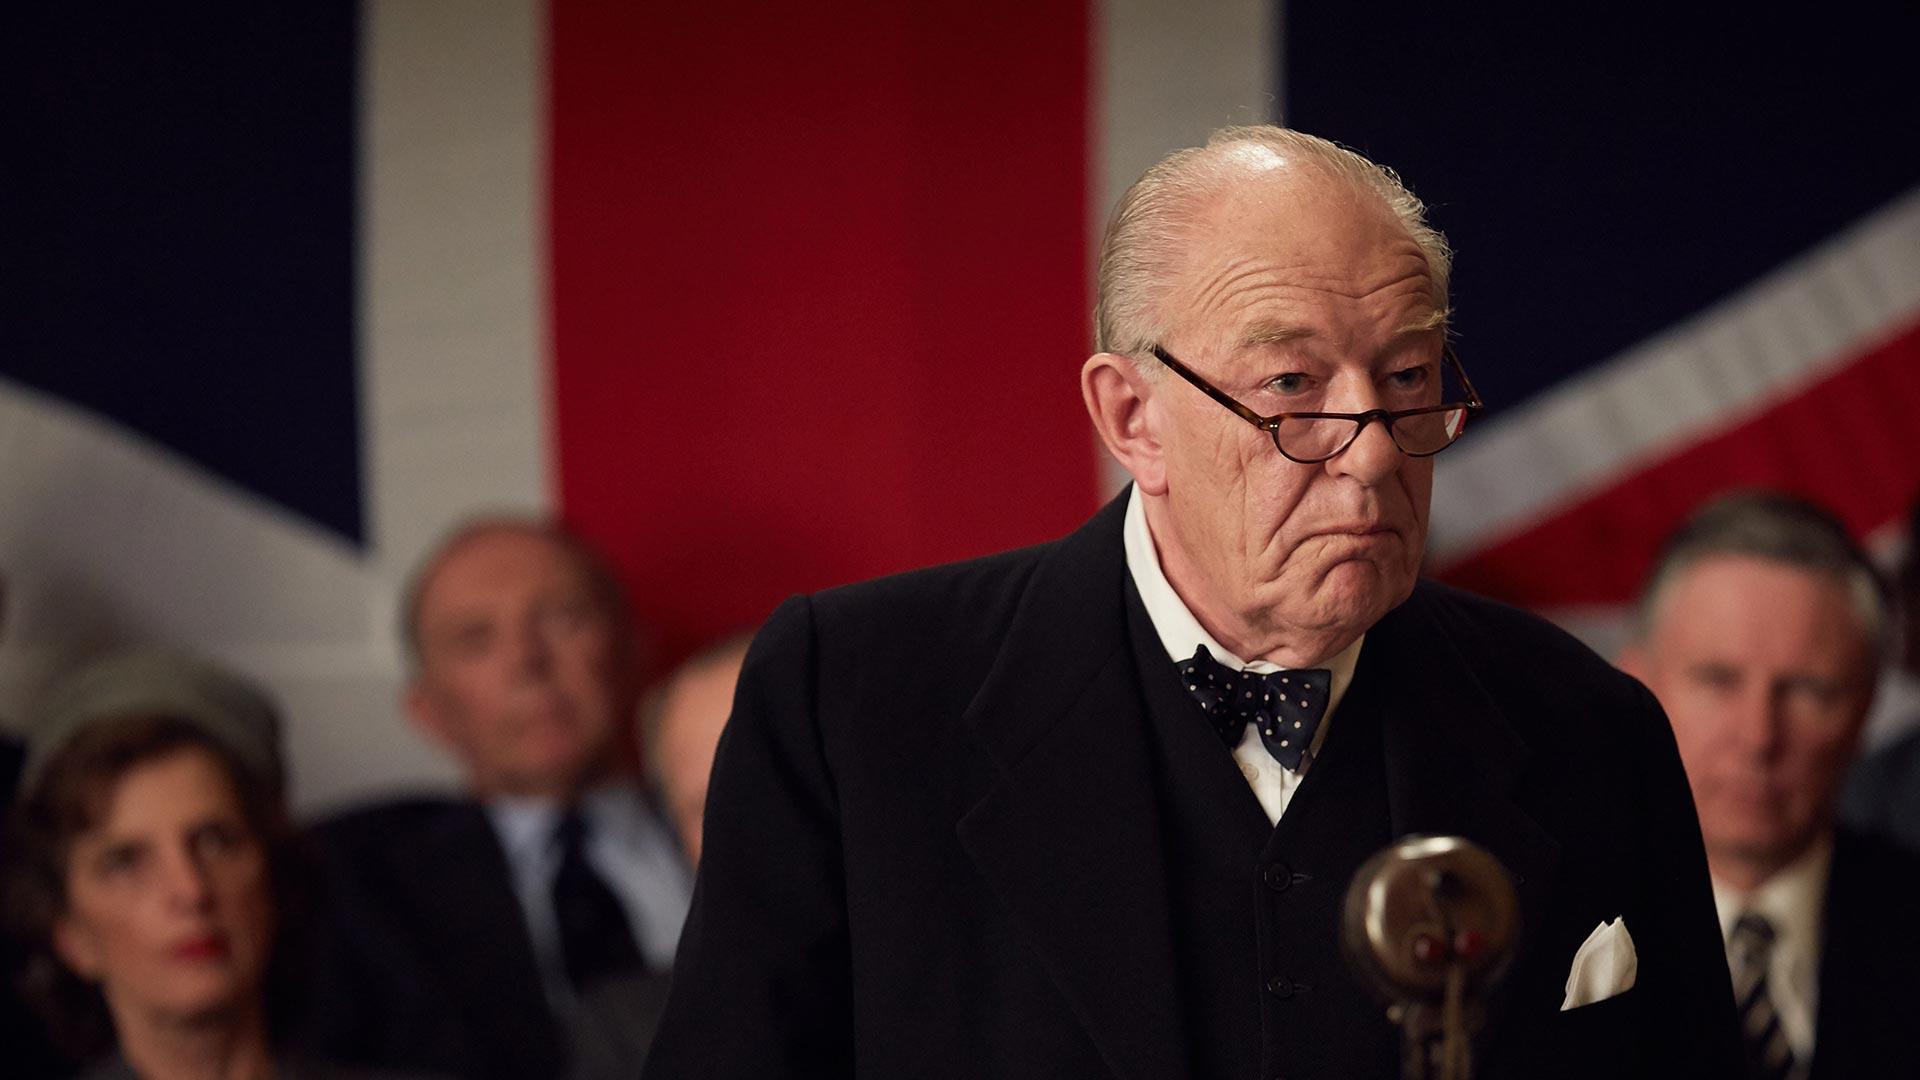 Michael Gambon as Winston Churchill